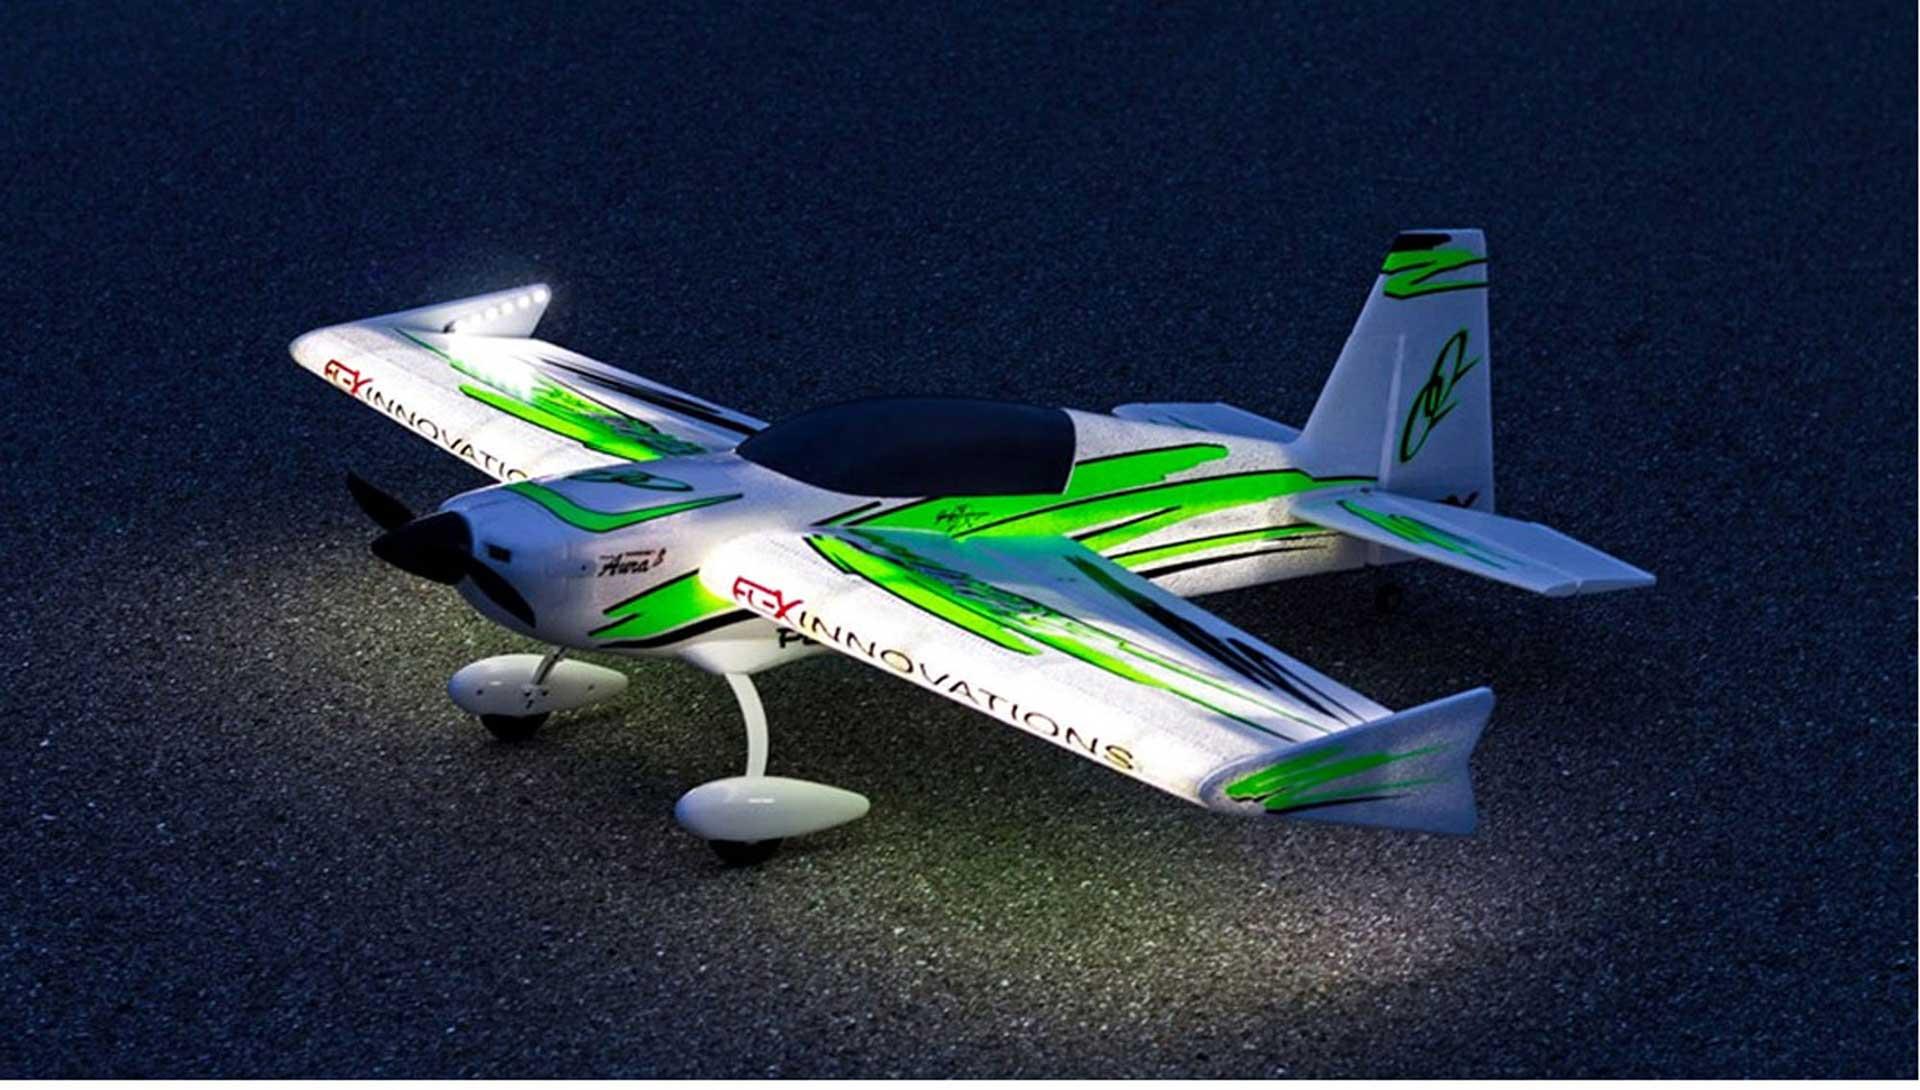 PREMIER AIRCRAFT QQ EXTRA 300 V2 NIGHT SUPER PNP AVEC LED ET AURA 8